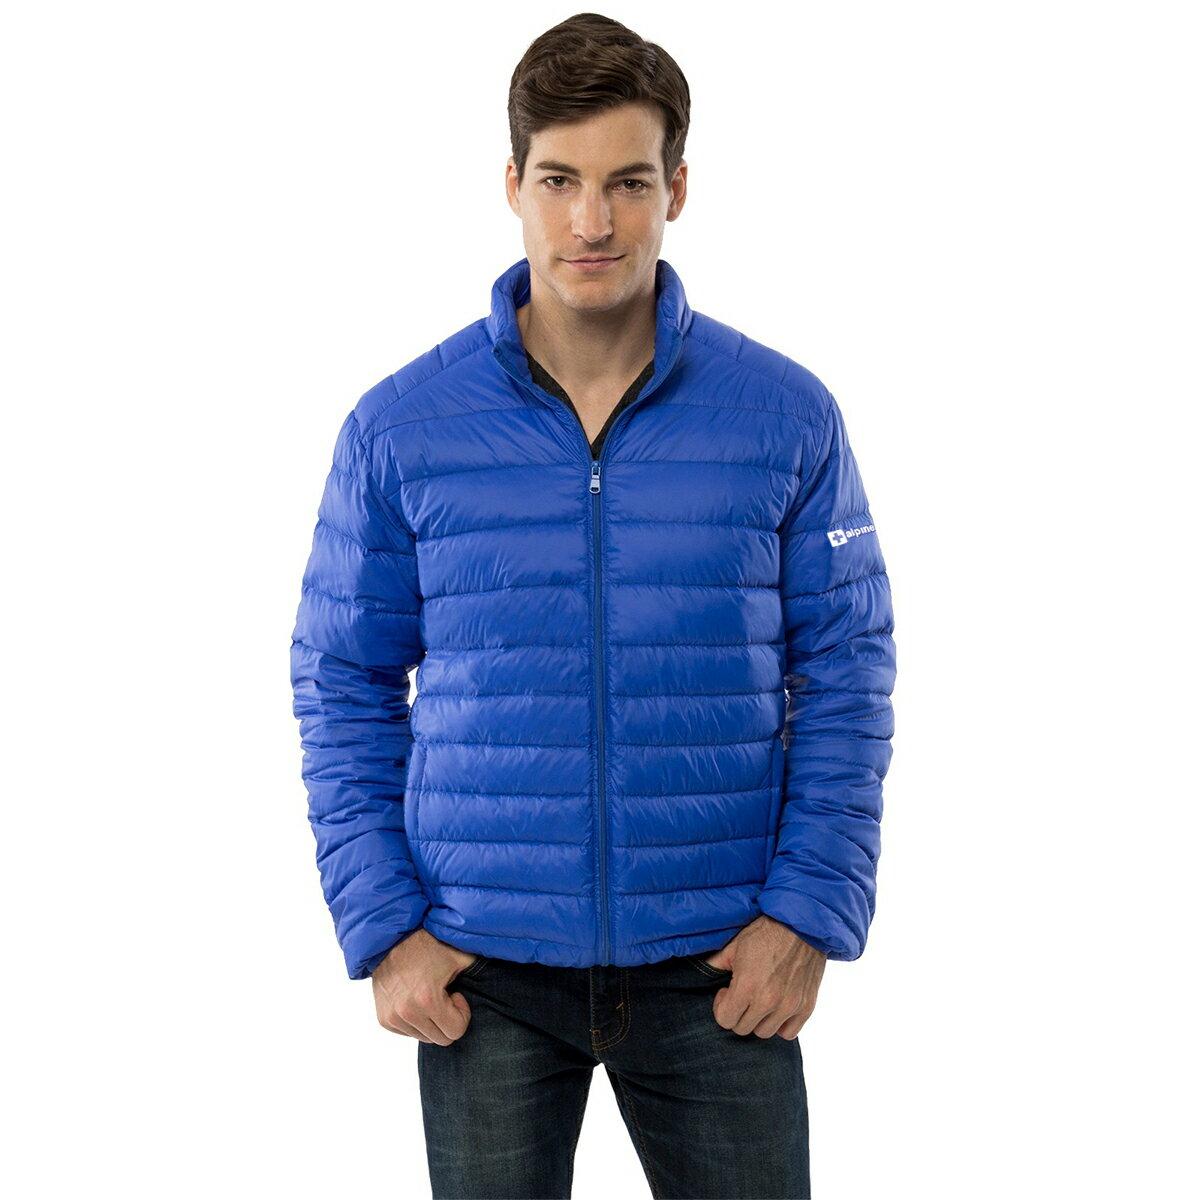 a8eea6560d6 Alpine Swiss Niko Men's Down Jacket Puffer Bubble Coat Packable Light Warm  Parka 4